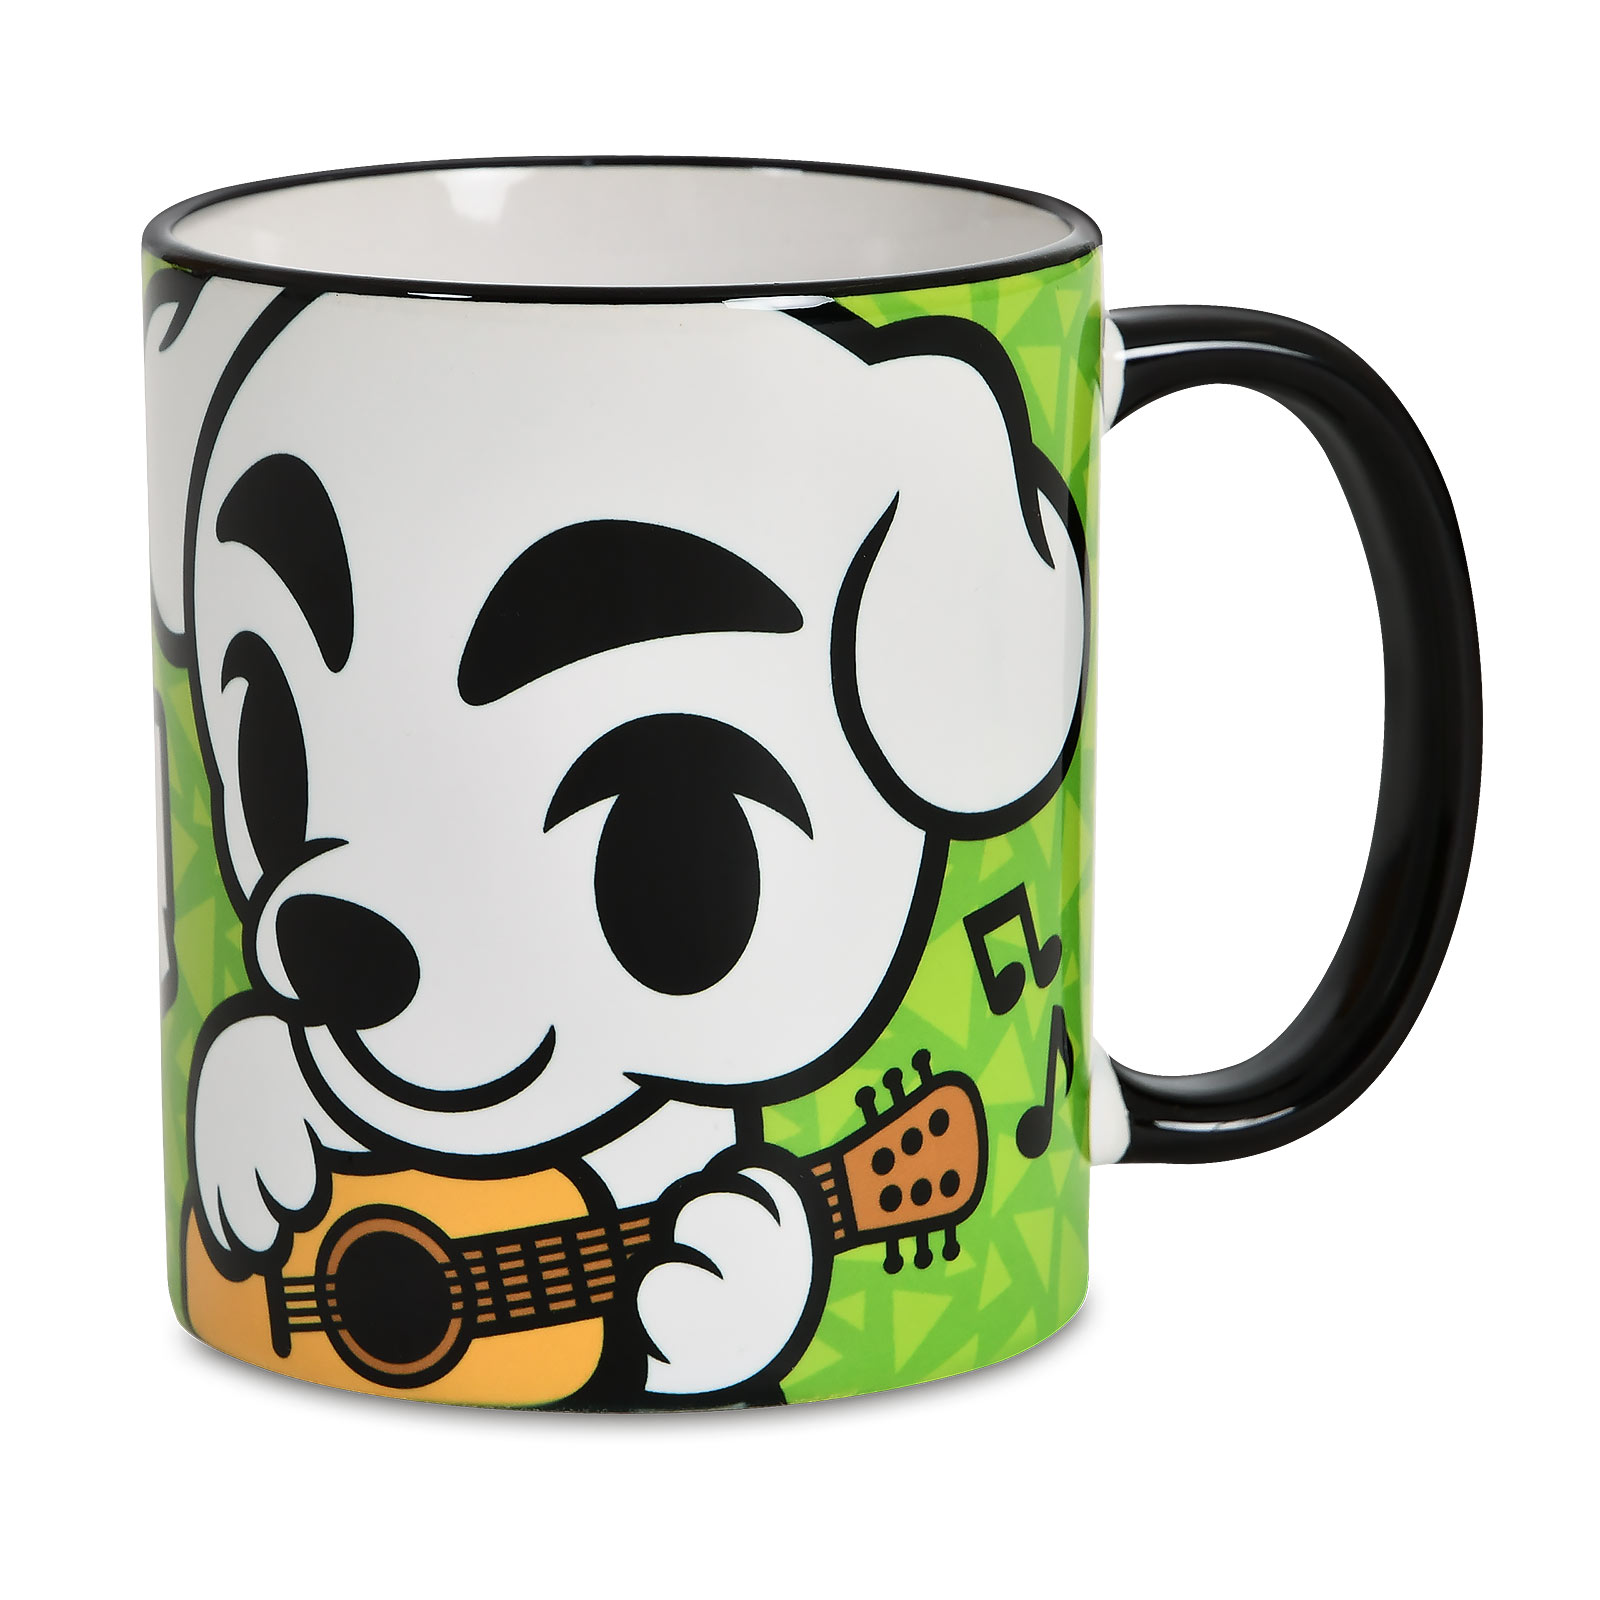 K.K. Slider Tasse für Animal Crossing Fans